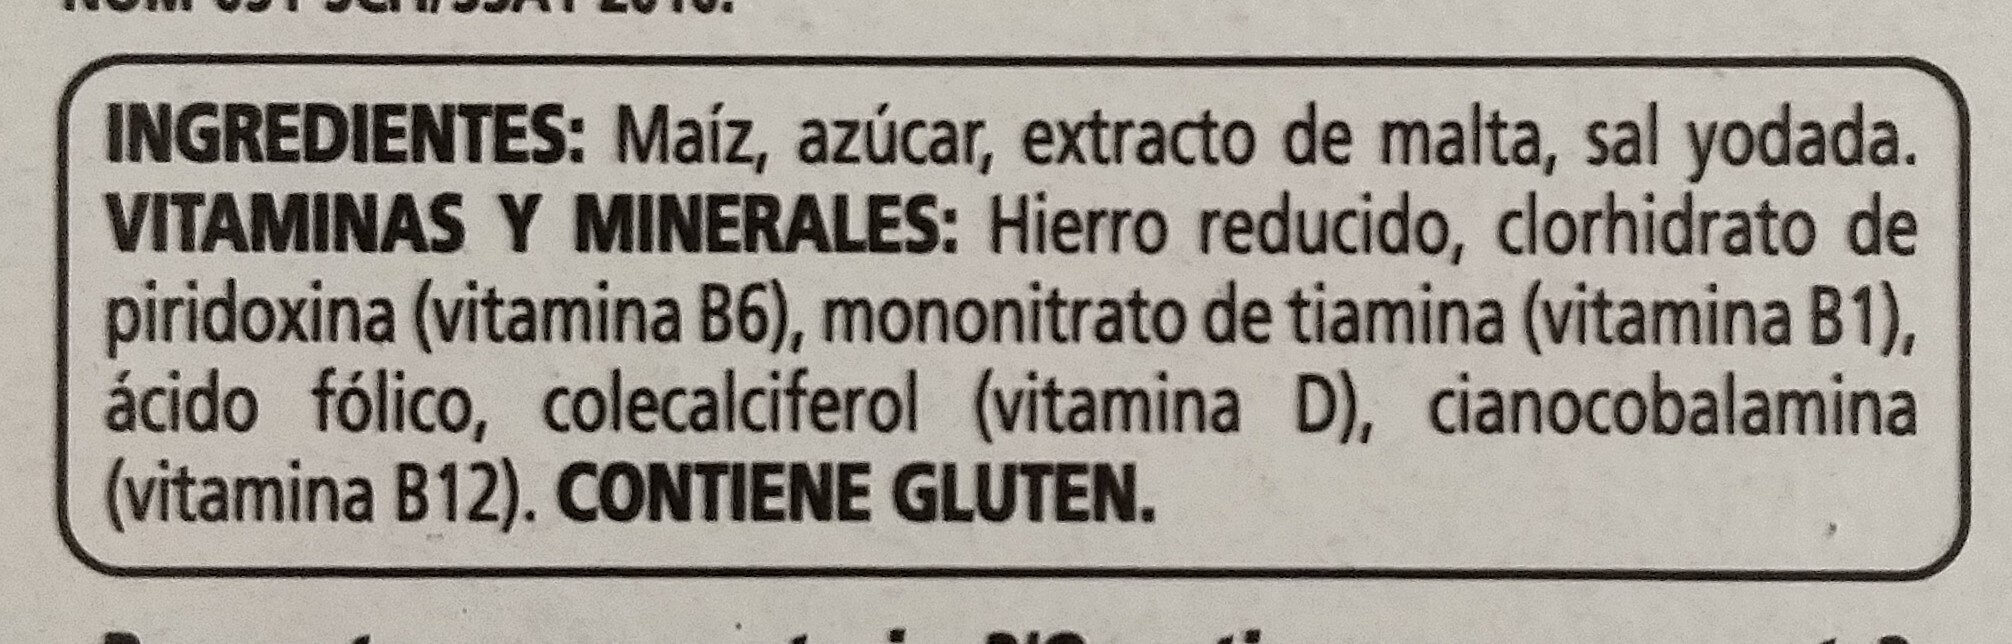 Corn Flakes - Ingrédients